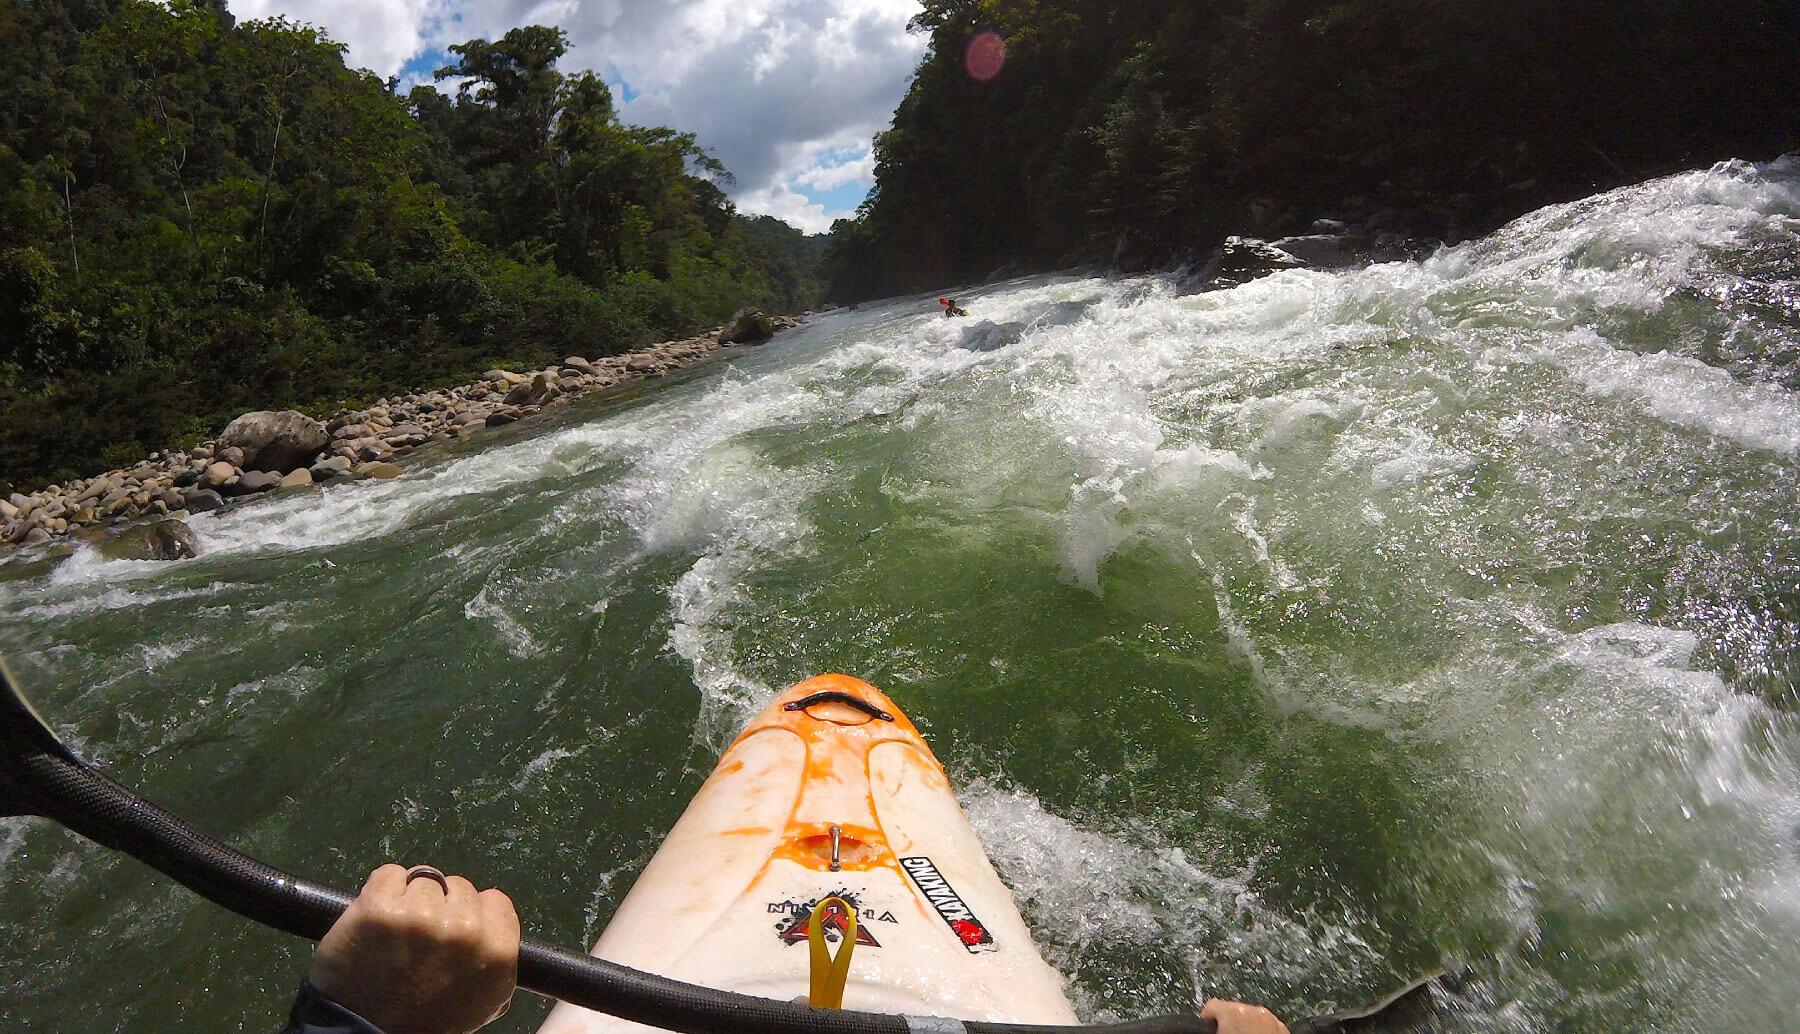 Kayaking view of a river in Ecuador